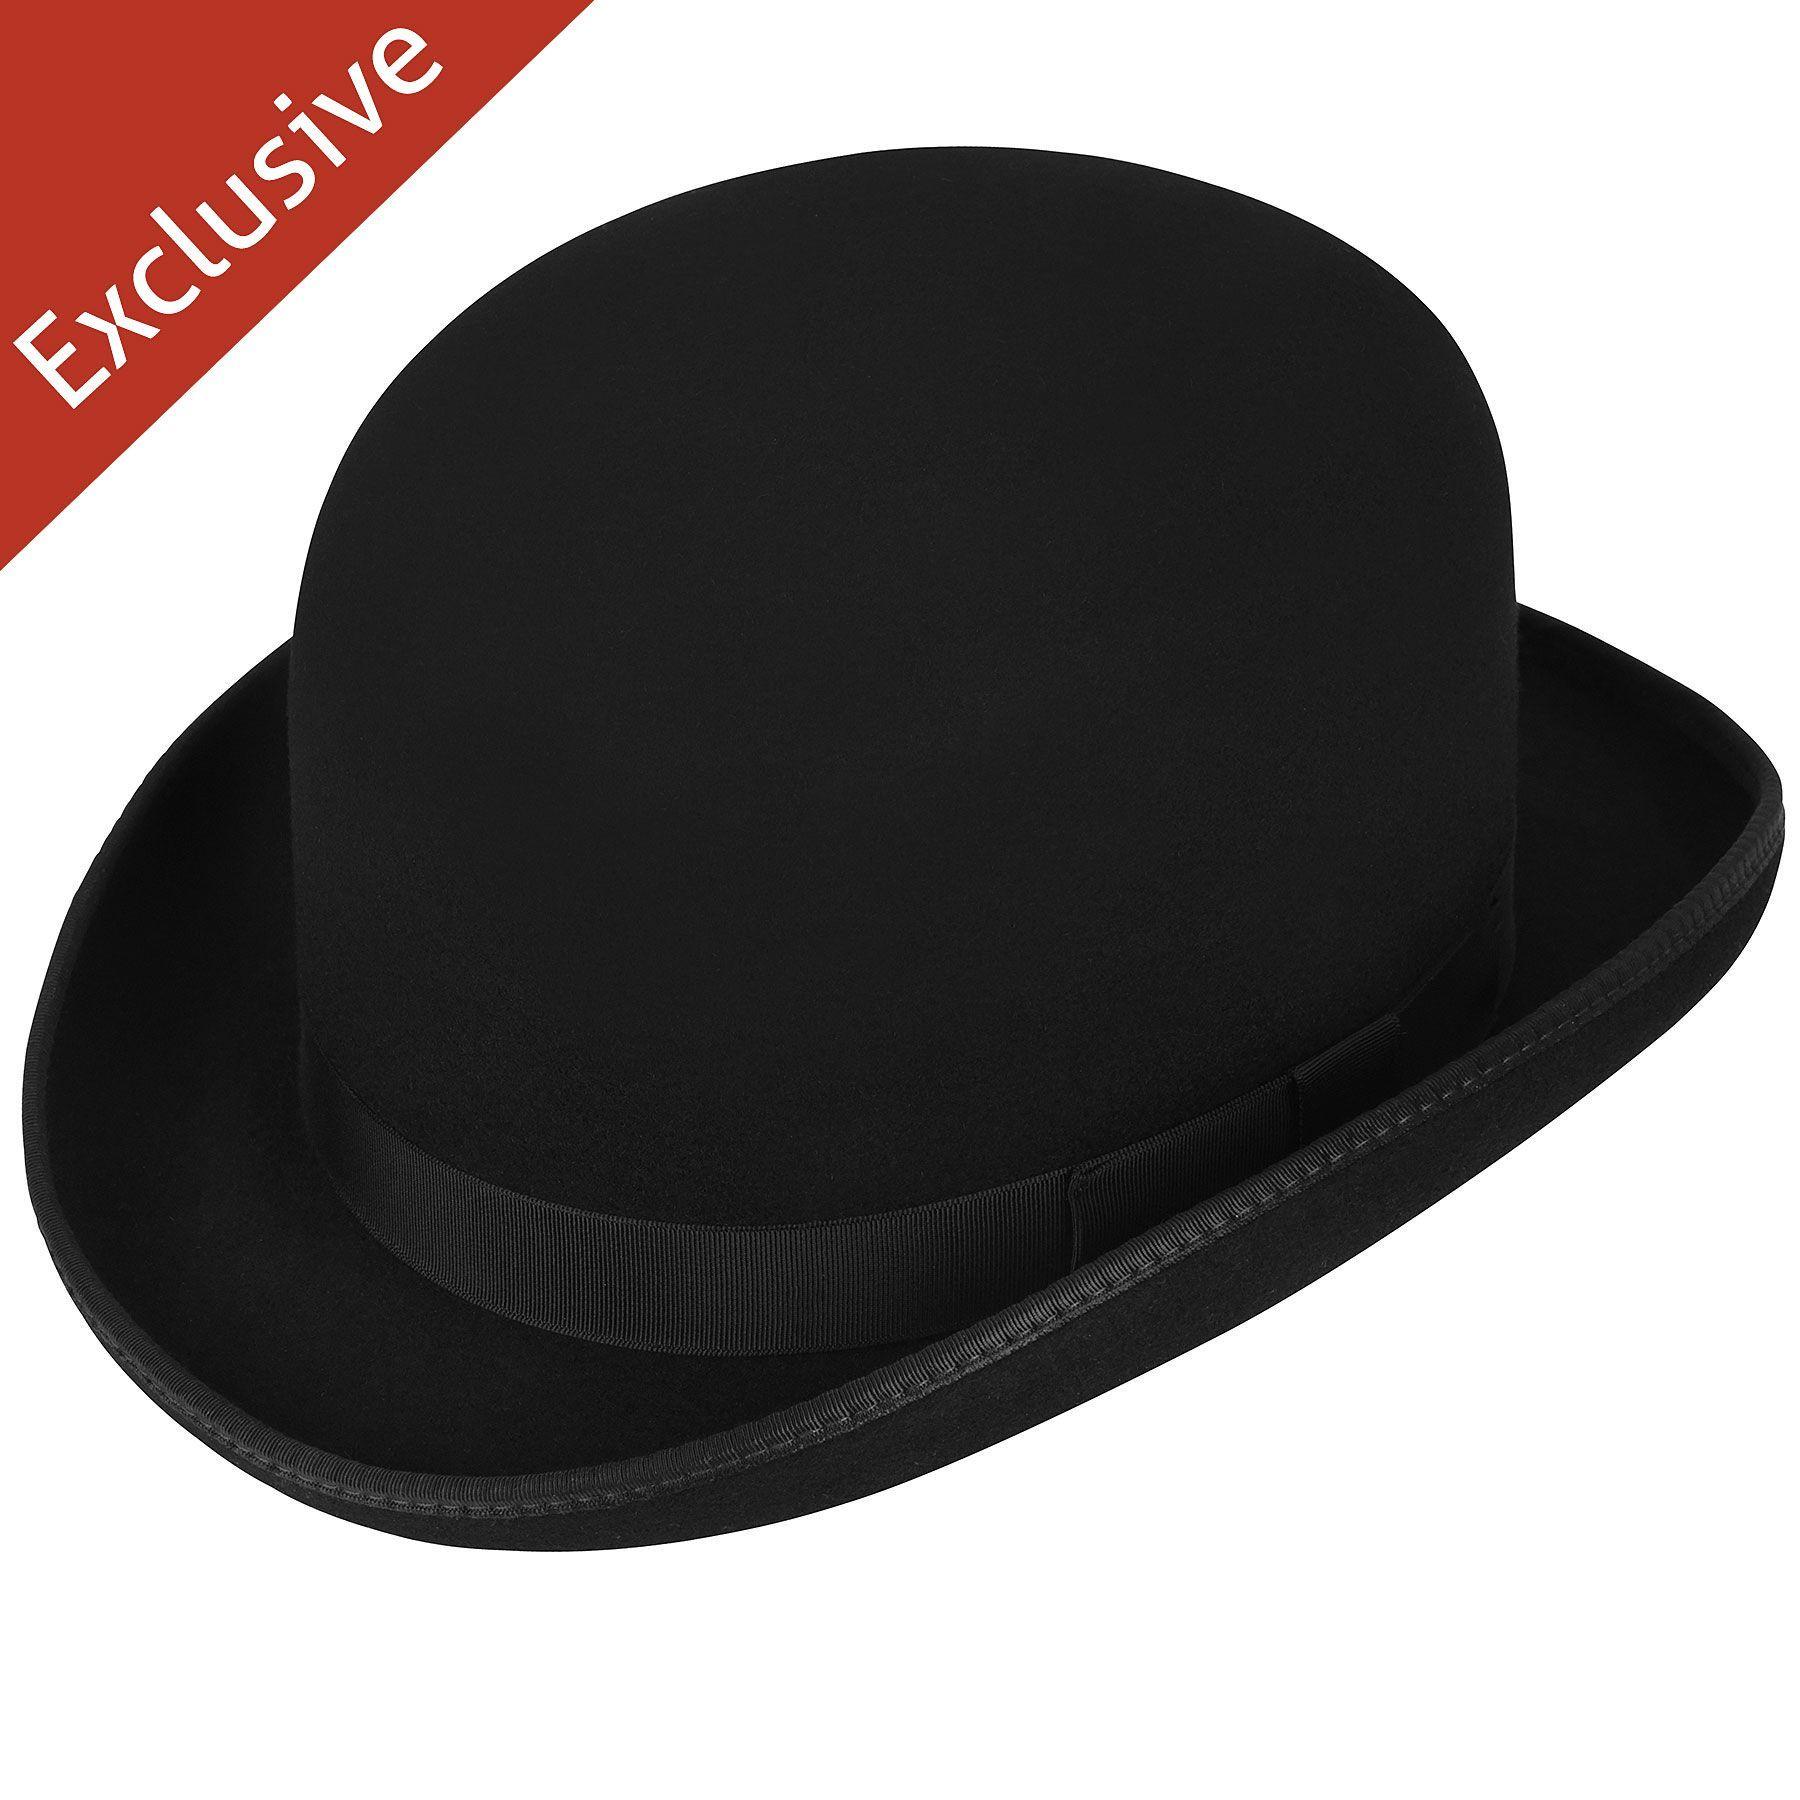 b60ca210 Steed Derby Hat Men's Hats, Derby Hats, Fedora Hat, Hats For Men,